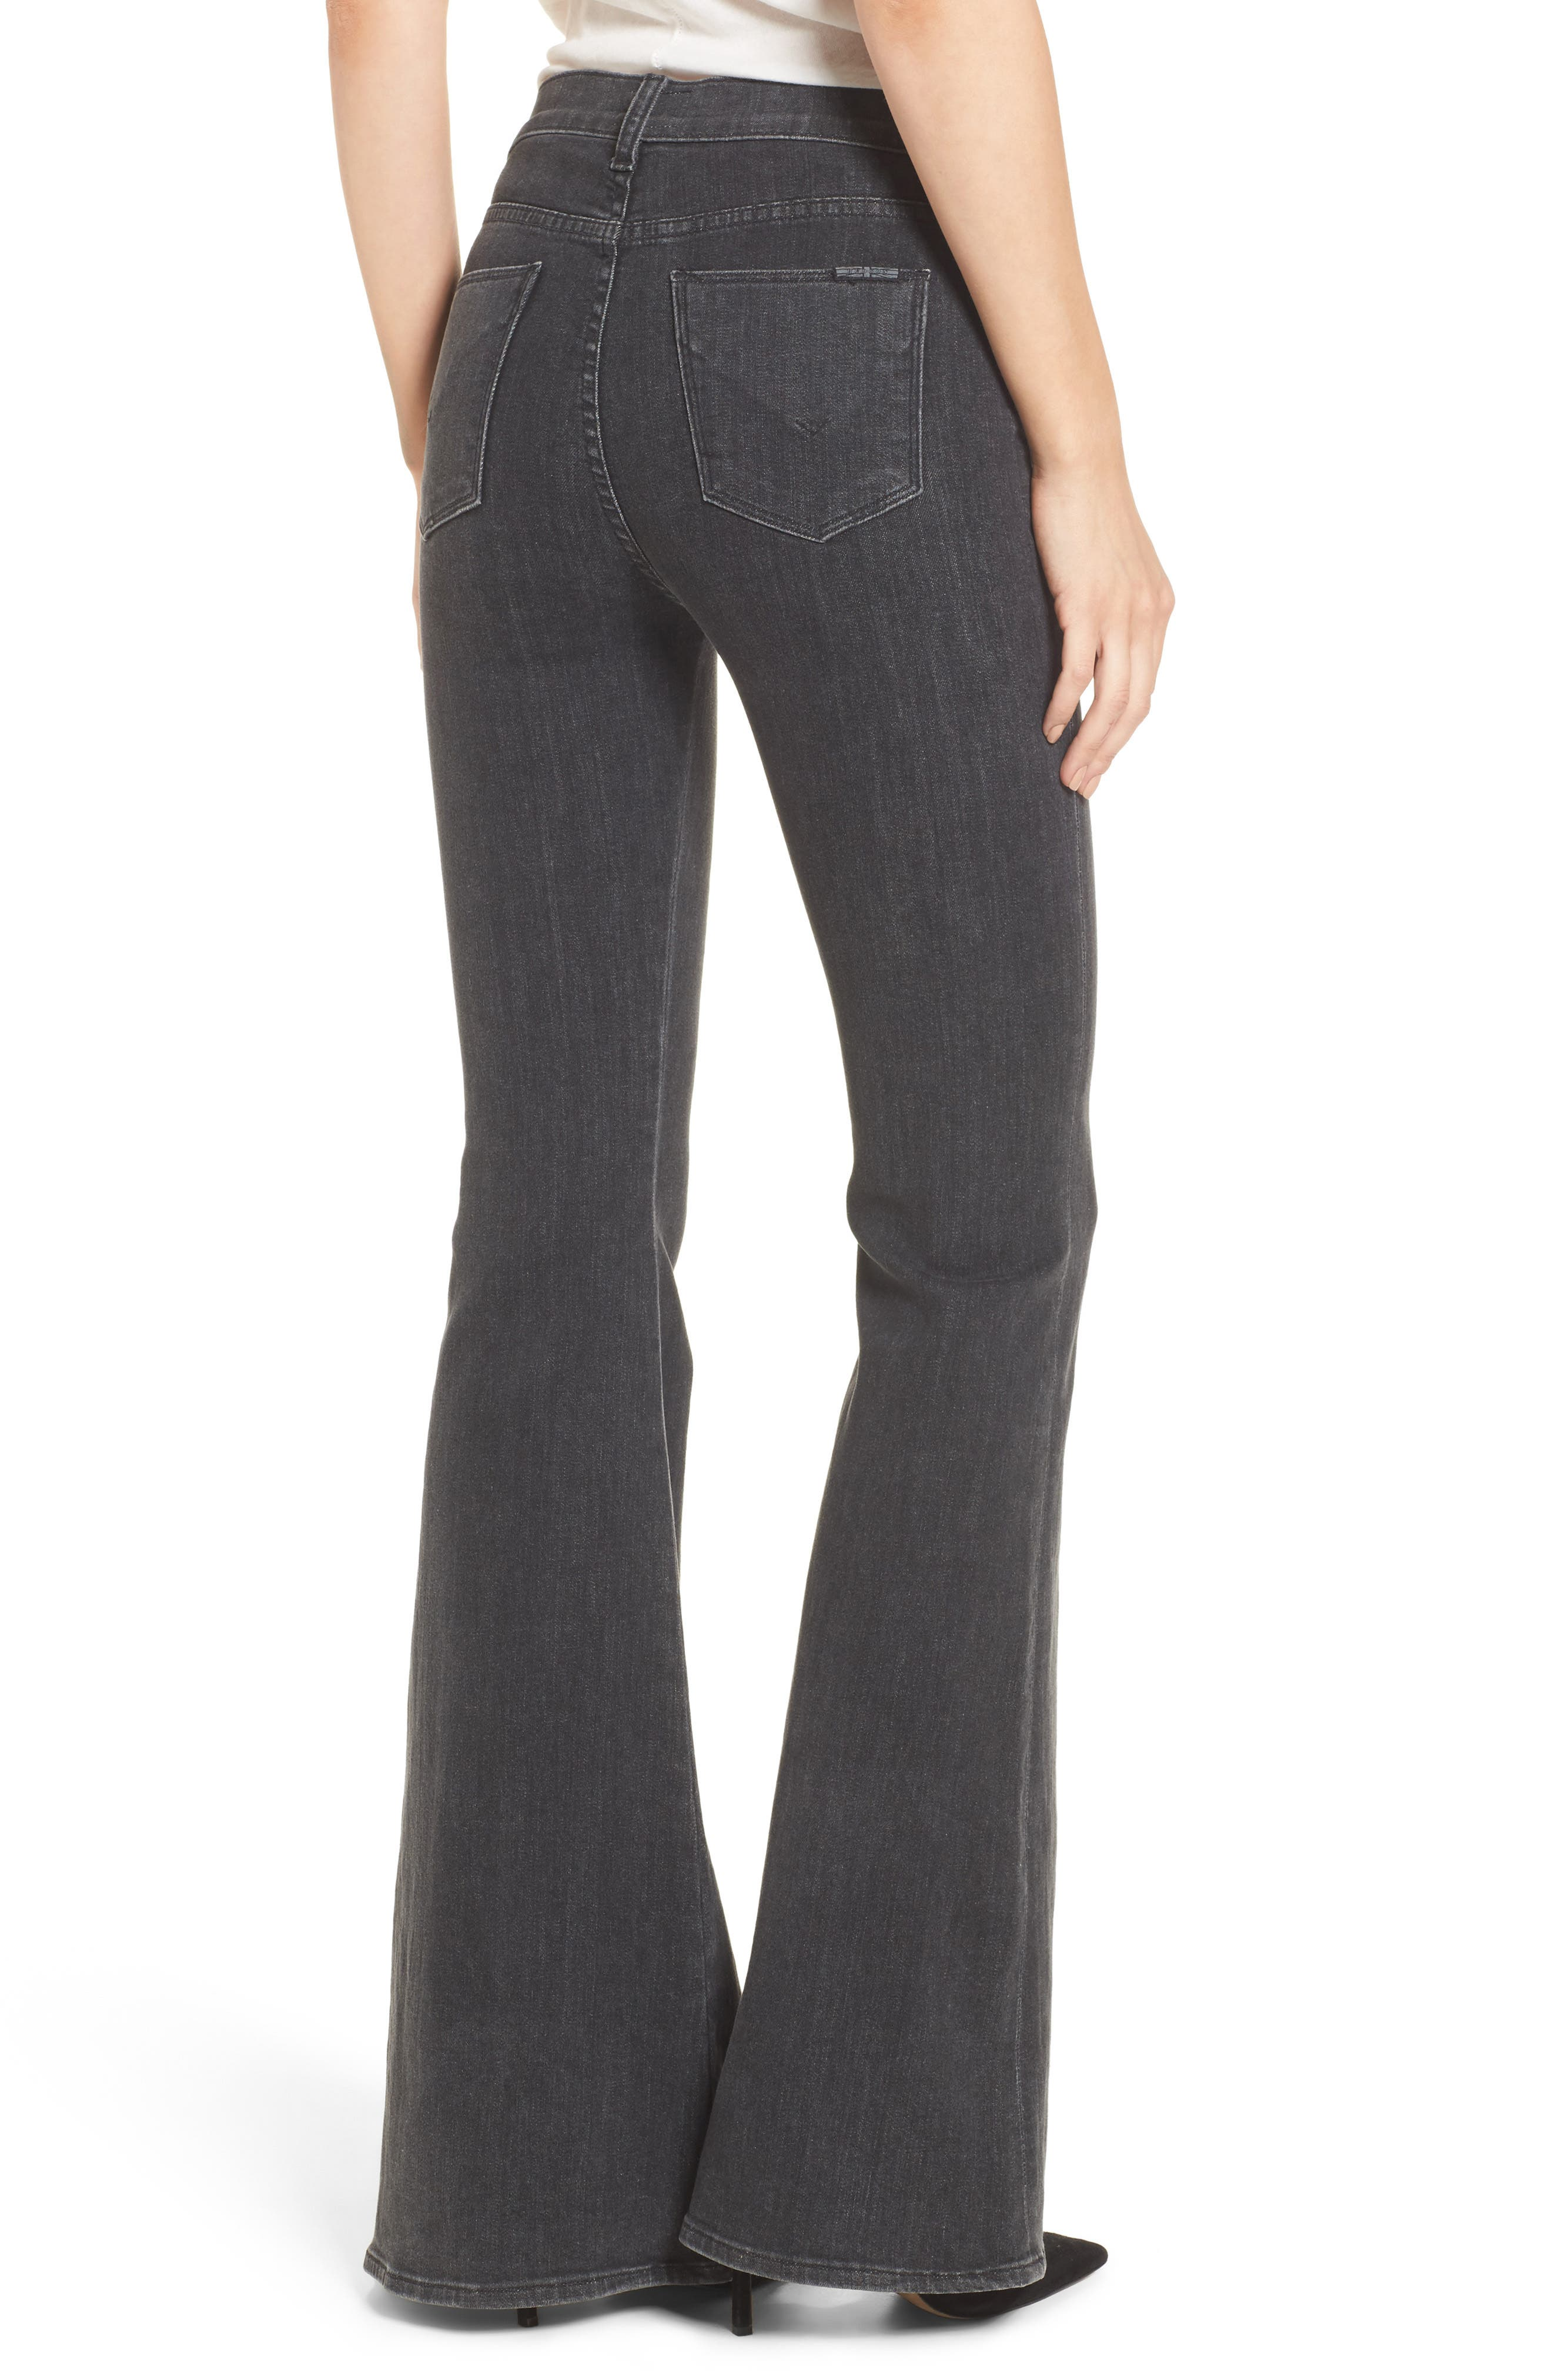 Bullocks High Waist Lace-Up Flare Jeans,                             Alternate thumbnail 2, color,                             064